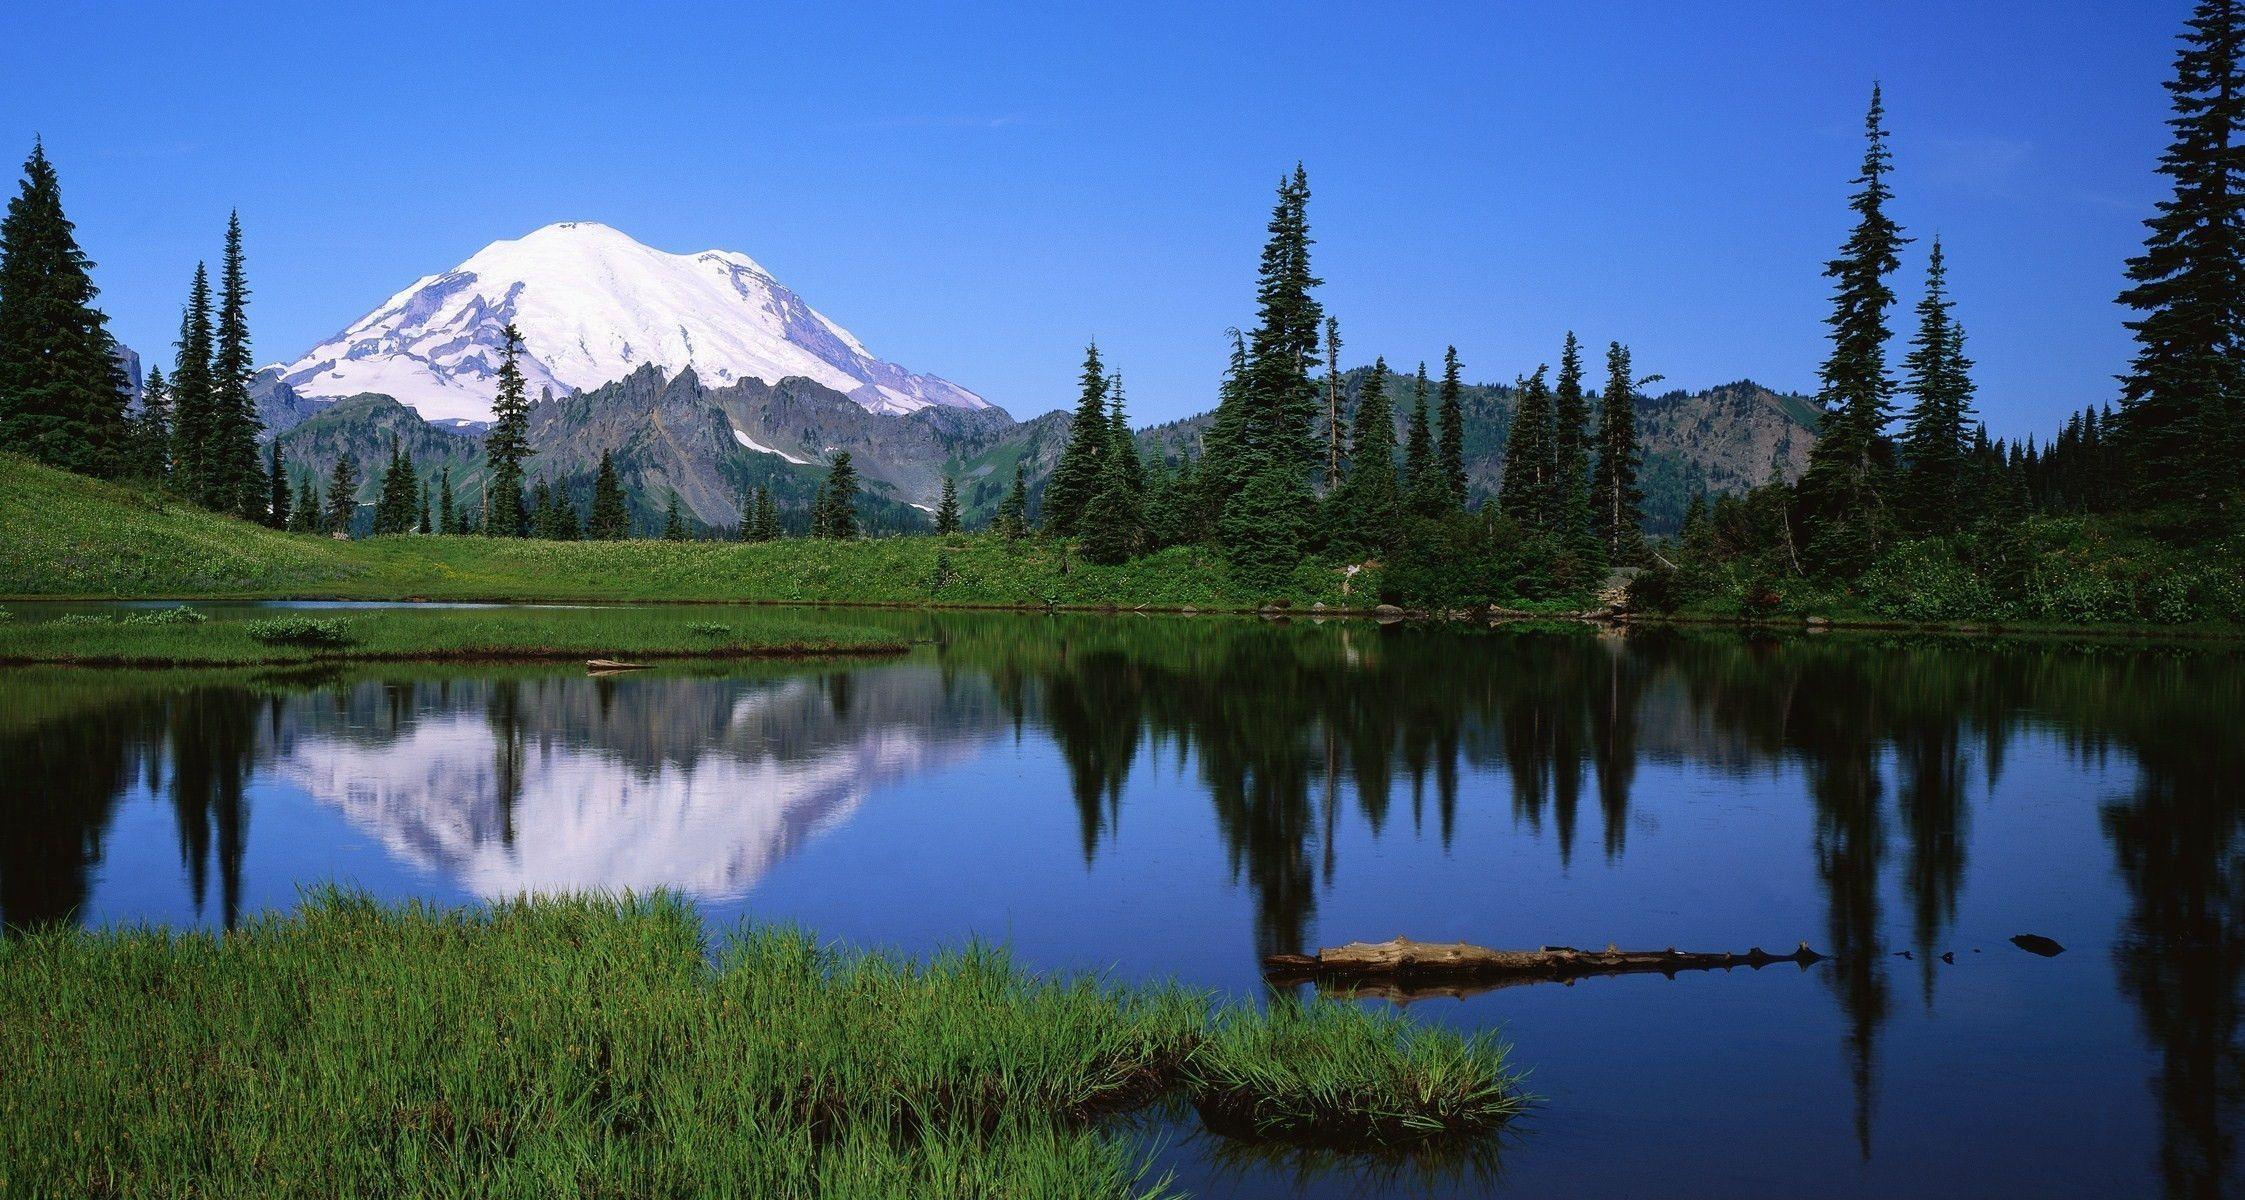 Mount Rainier National Park Wallpapers 2245x1200